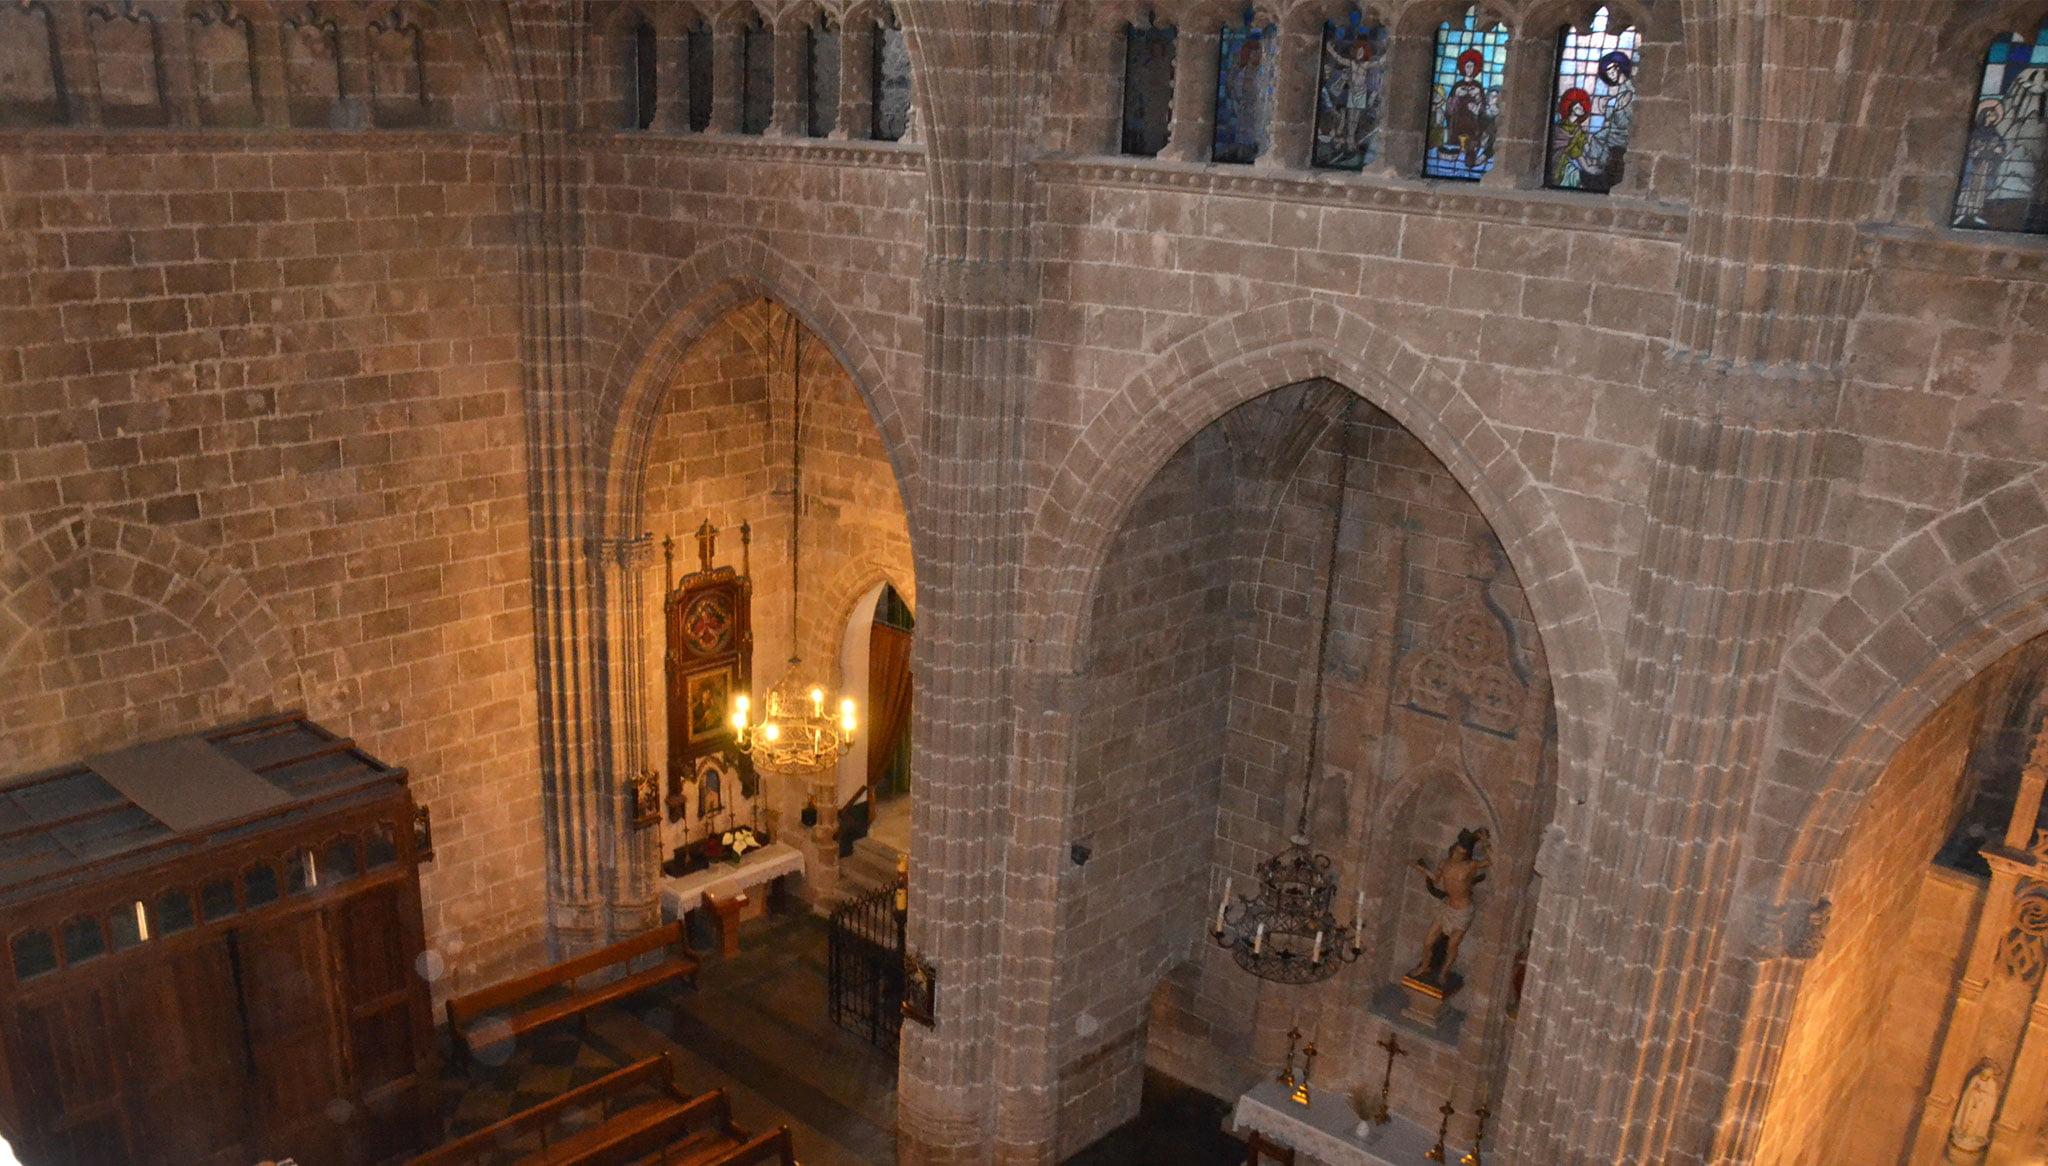 Interior de la Iglesia de San Bartolomé visto desde arriba